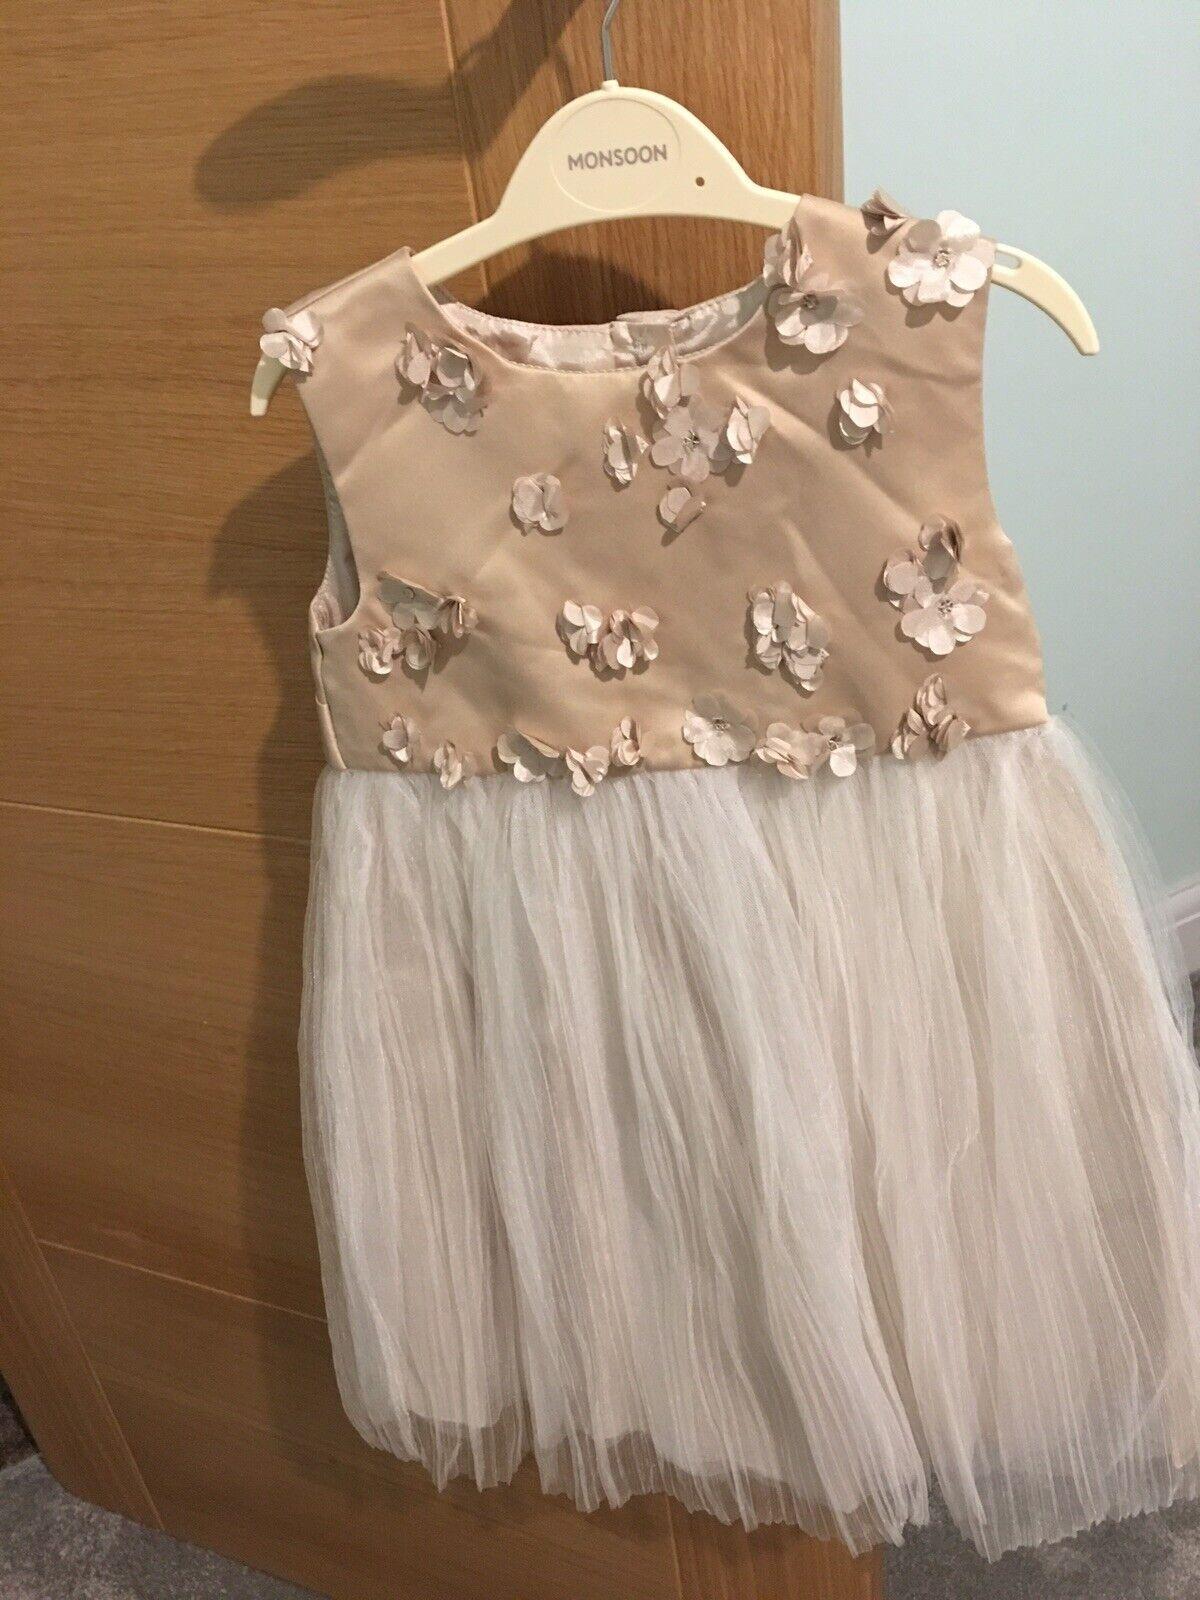 **Brand New** Monsoon Girls Bridesmaid Flowergirl Dress Age 2-3 Gold White